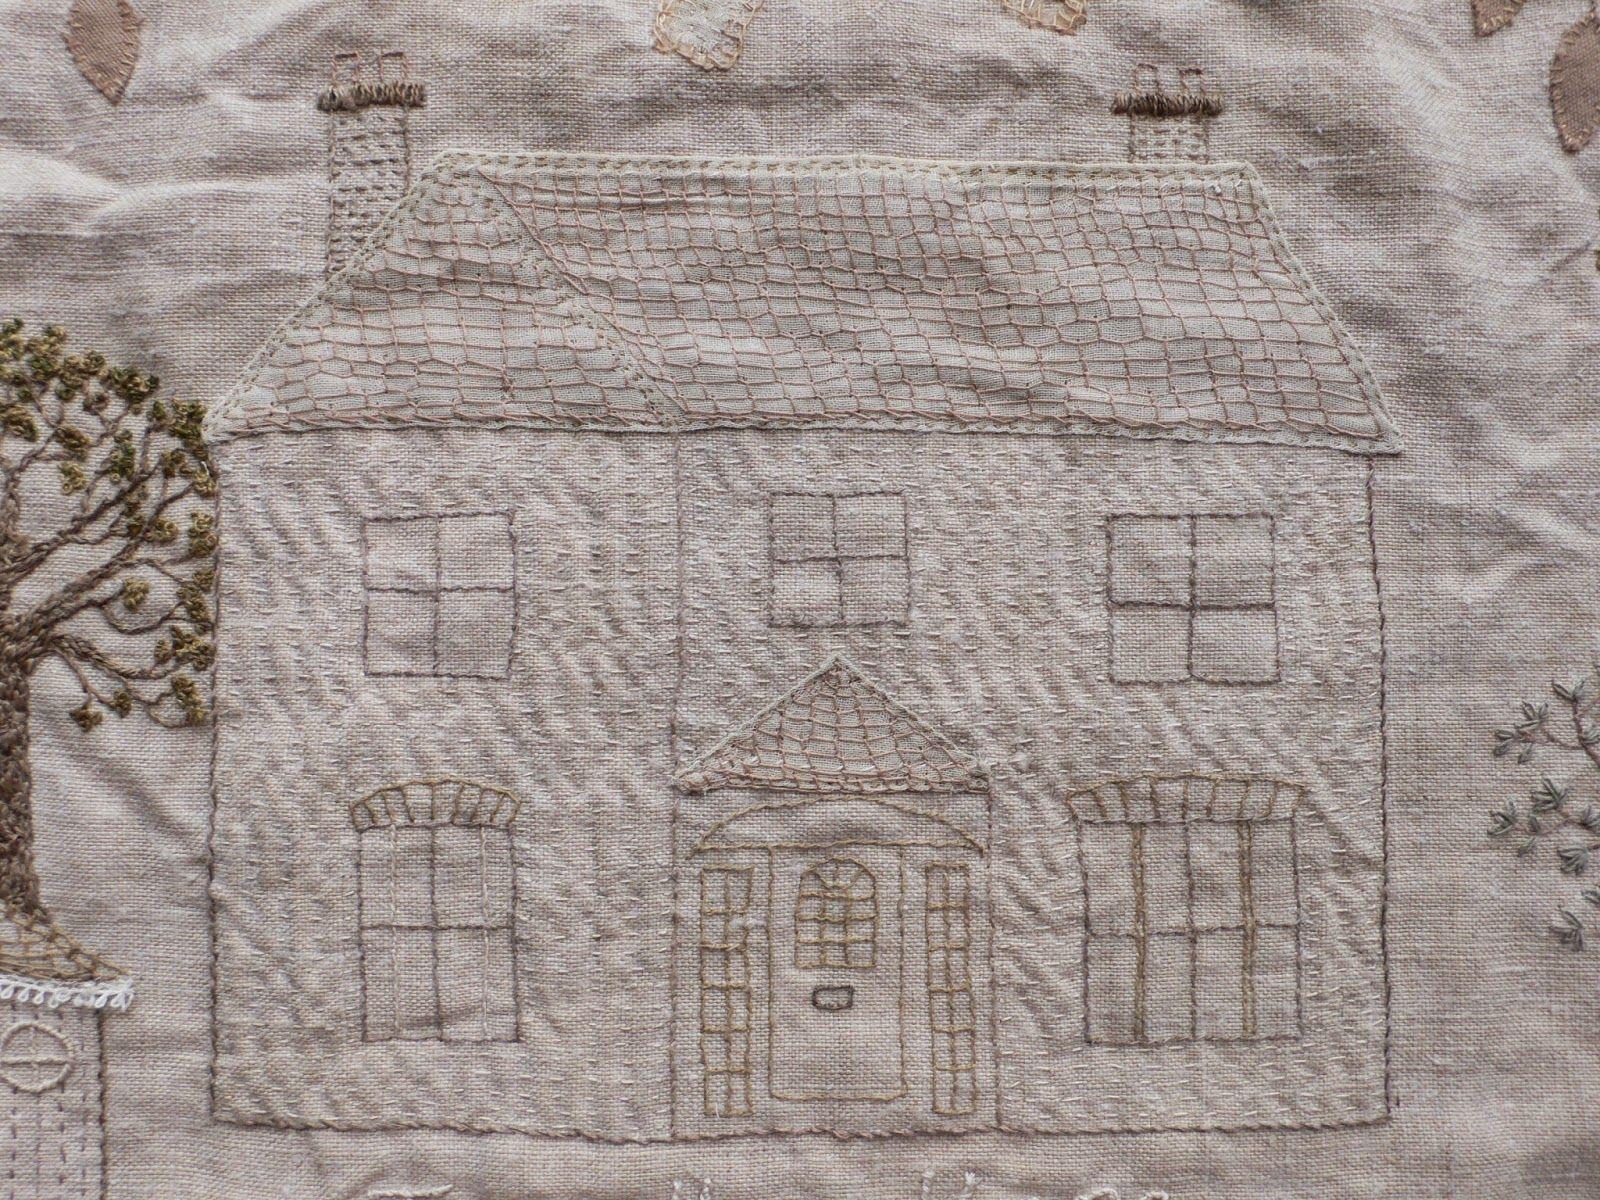 gentlework: Trevethoe House - embroidery details